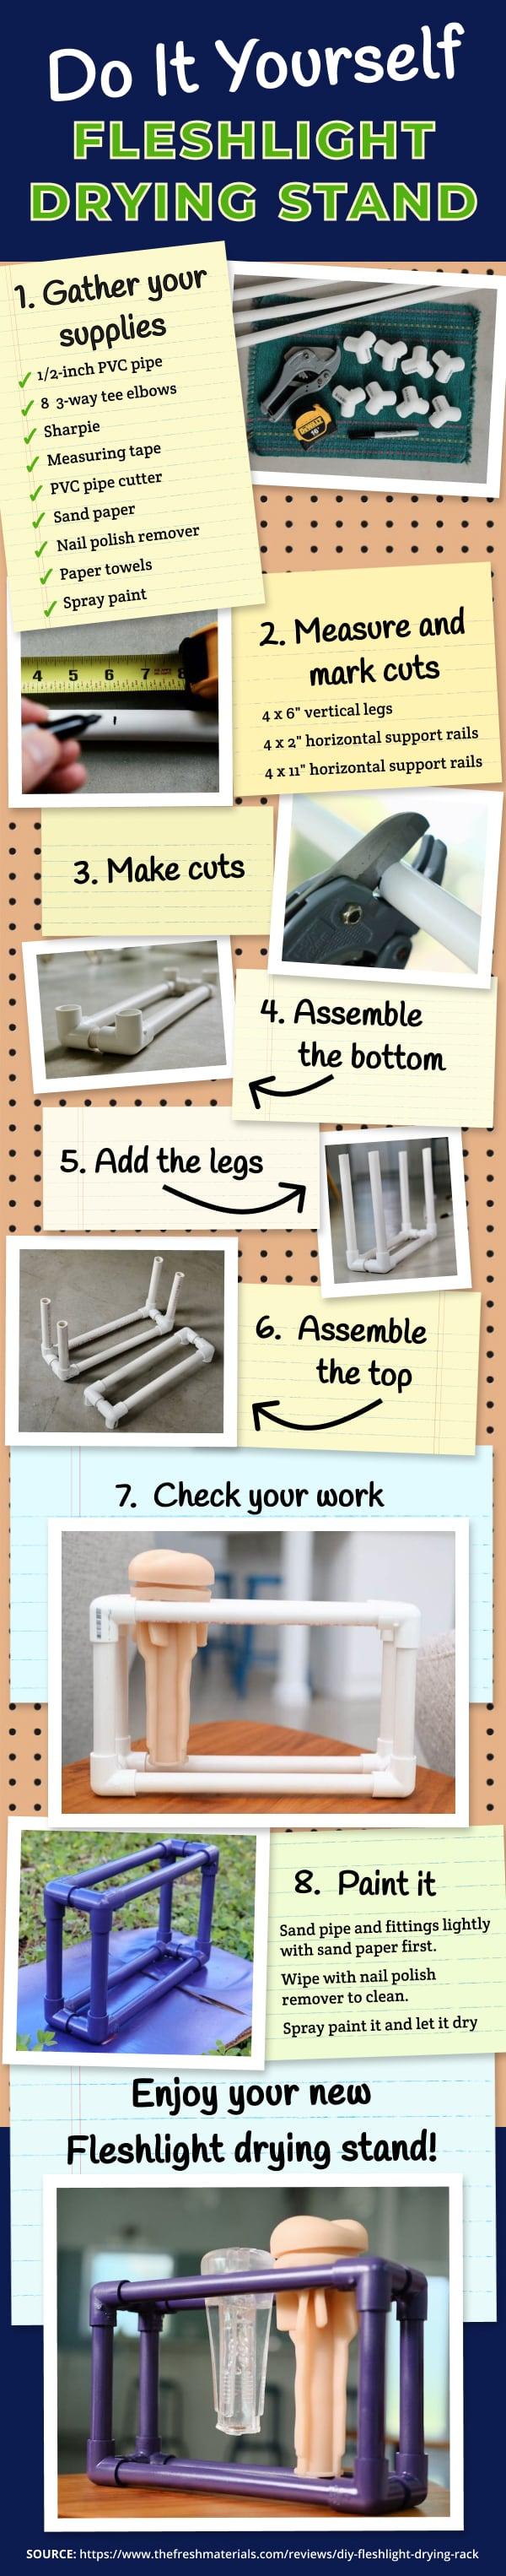 DIY Fleshlight Drying Rack Infographic